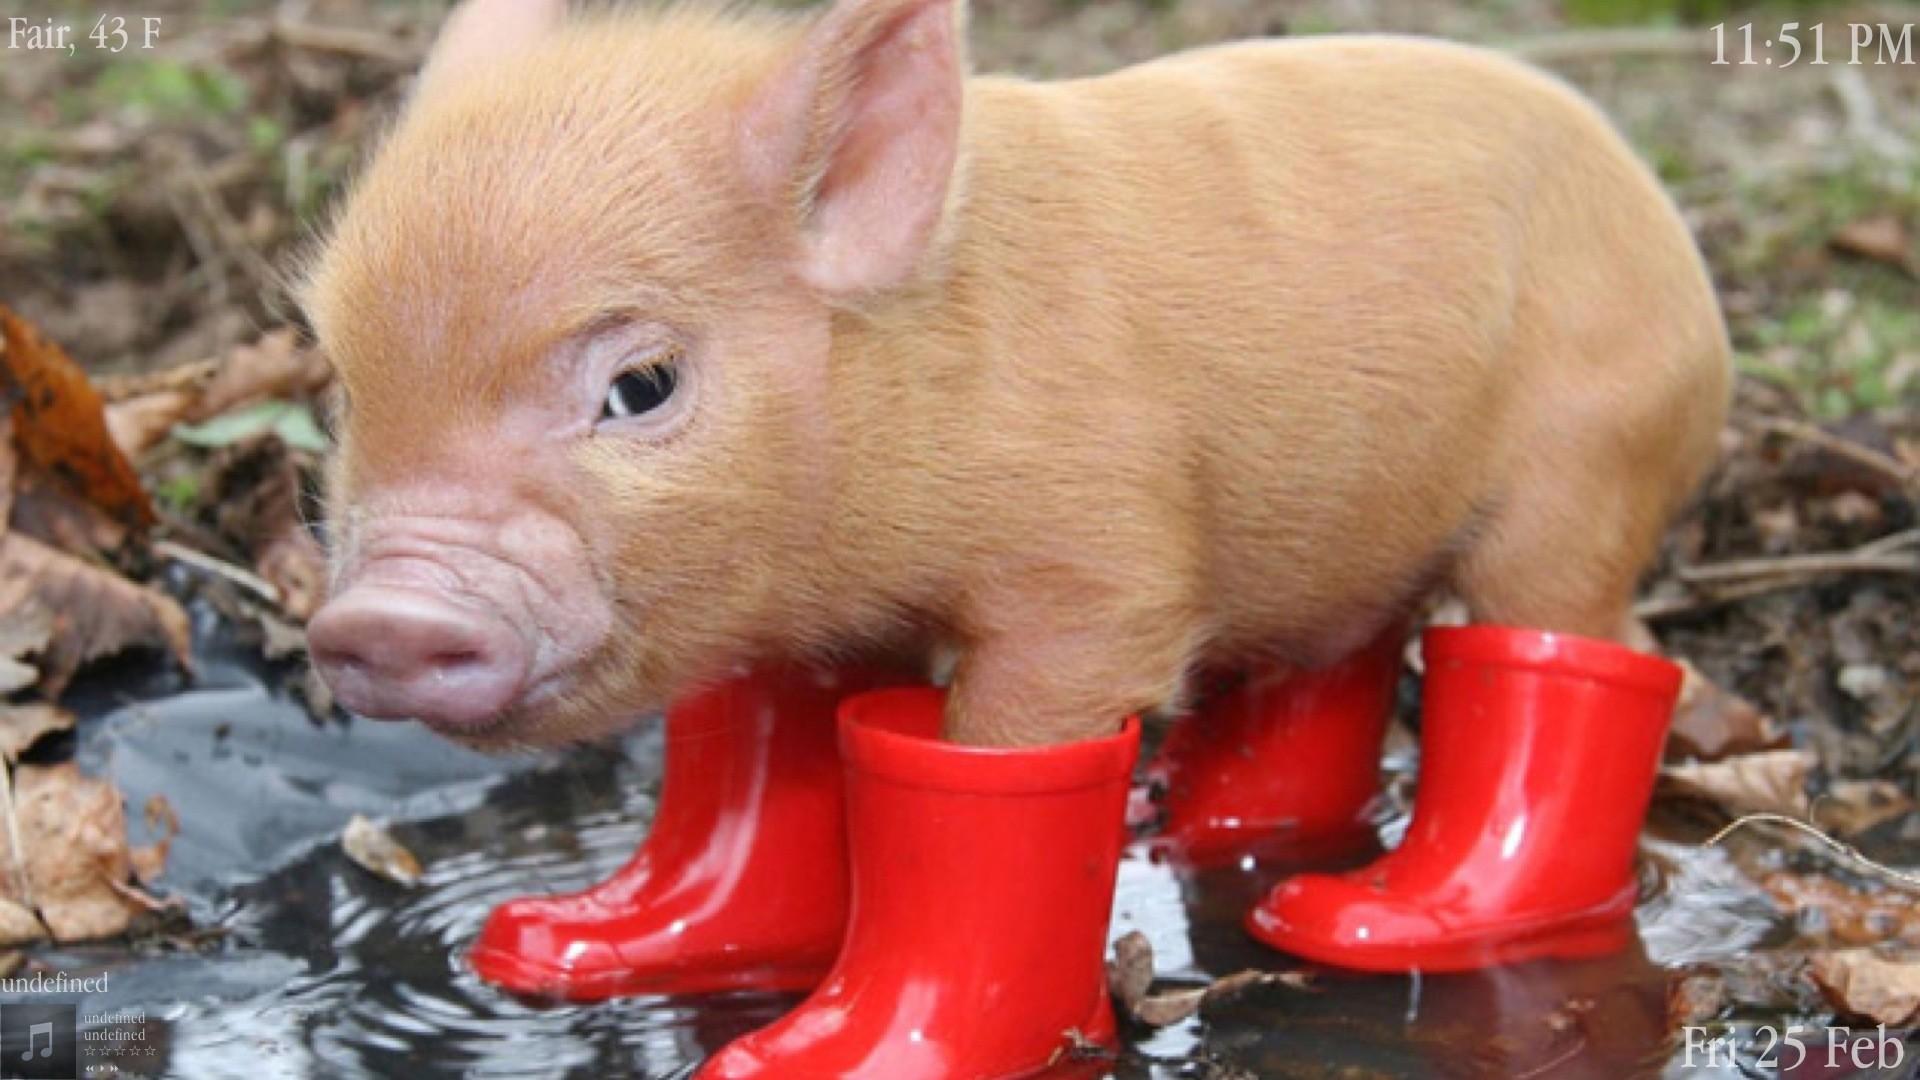 Cute Pig Wallpaper ·①